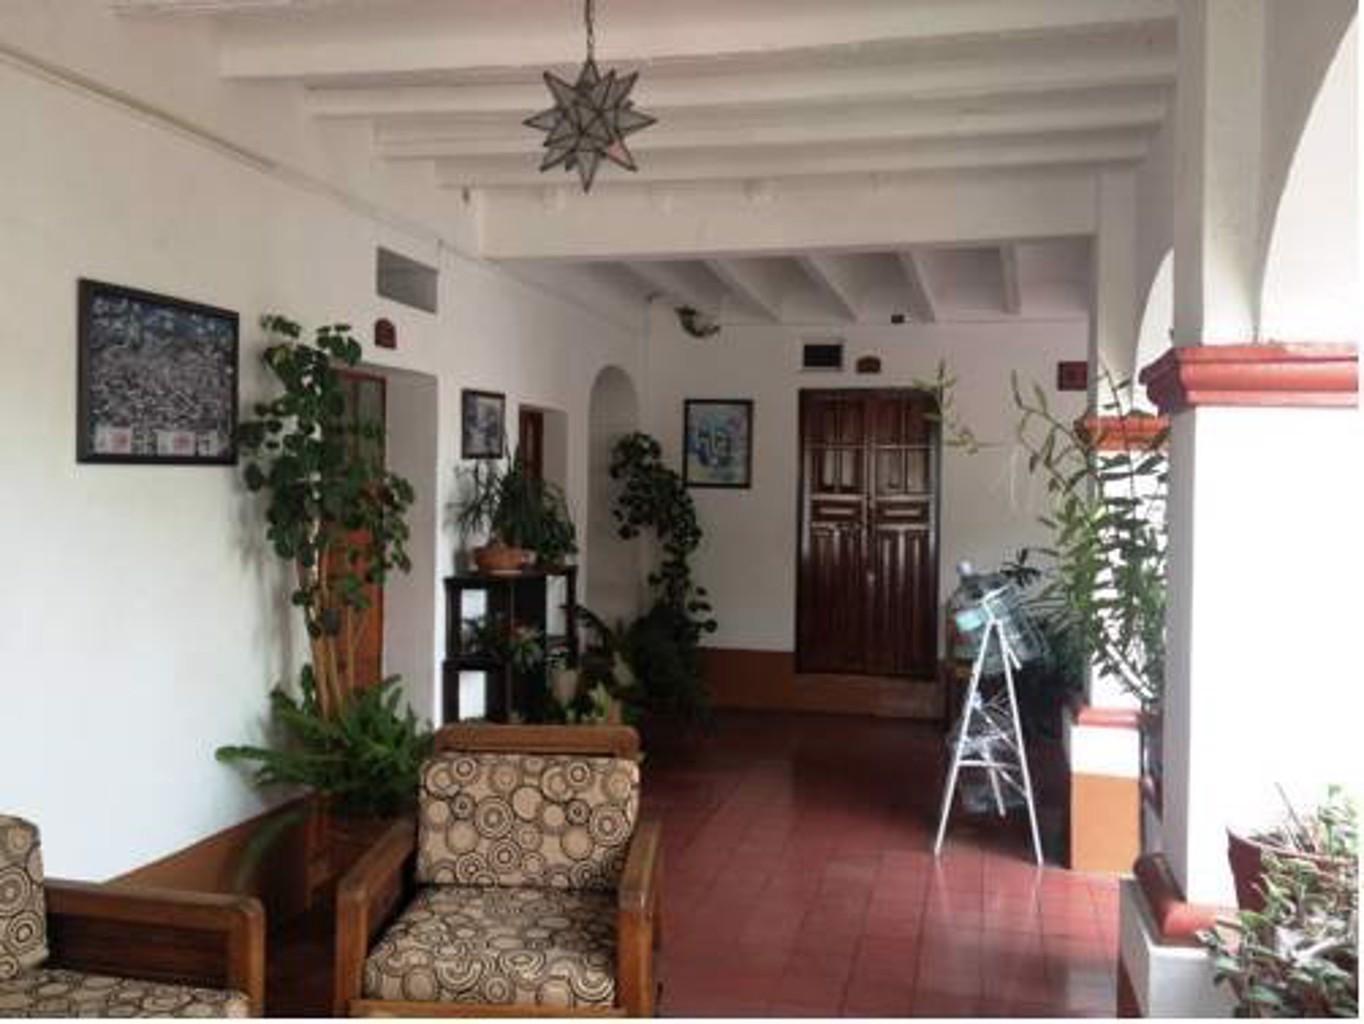 Gallery image of Hotel Posada Santa Anita